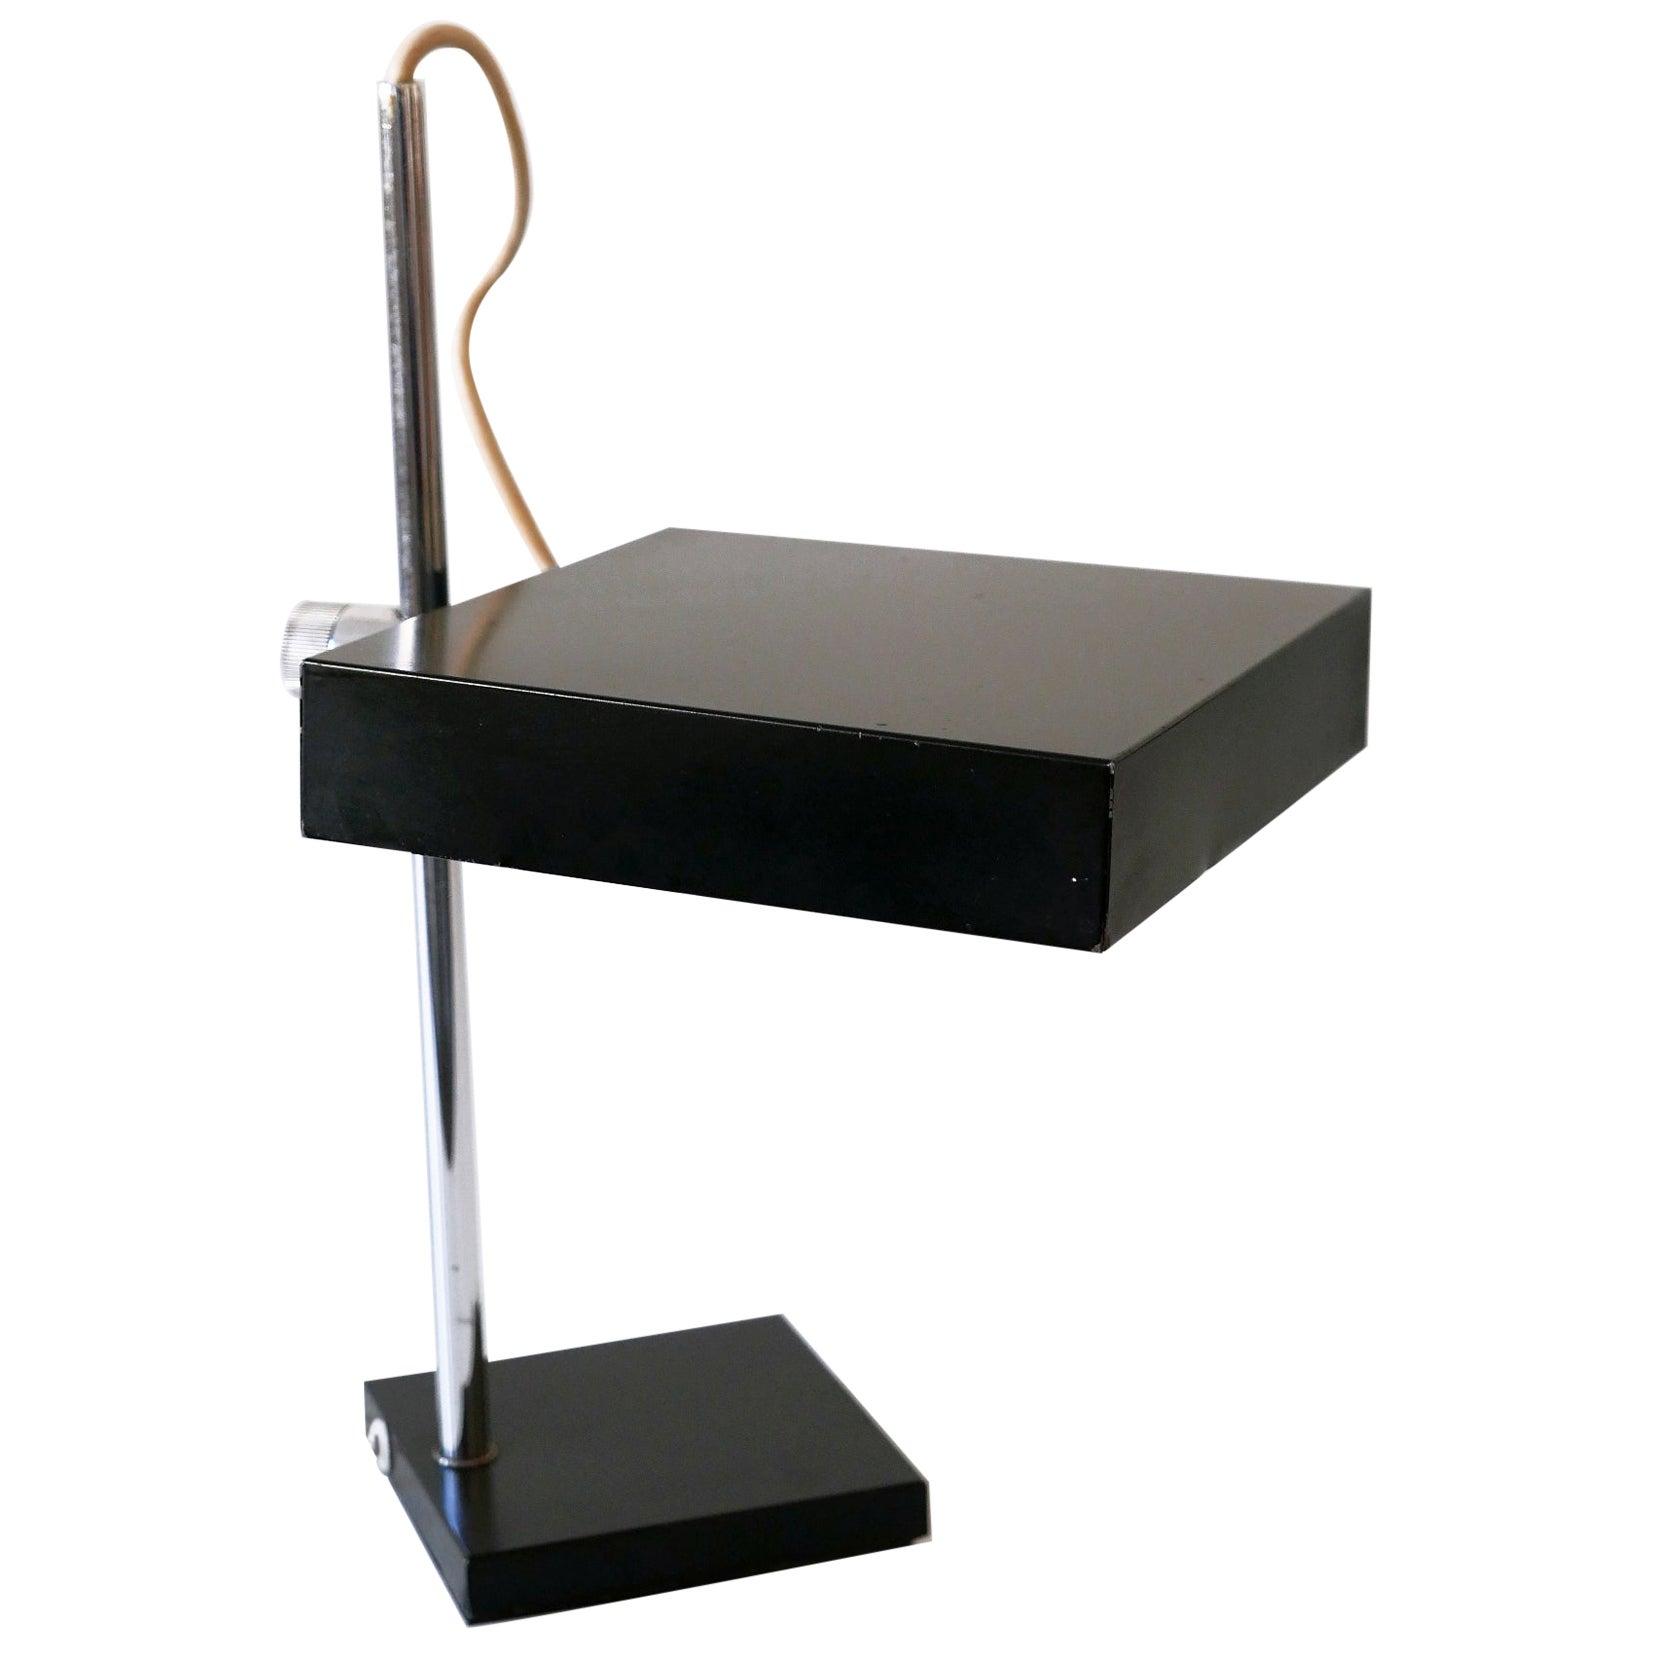 Mid-Century Modern Table Lamp '6640' by Kaiser Leuchten, 1960s, Germany